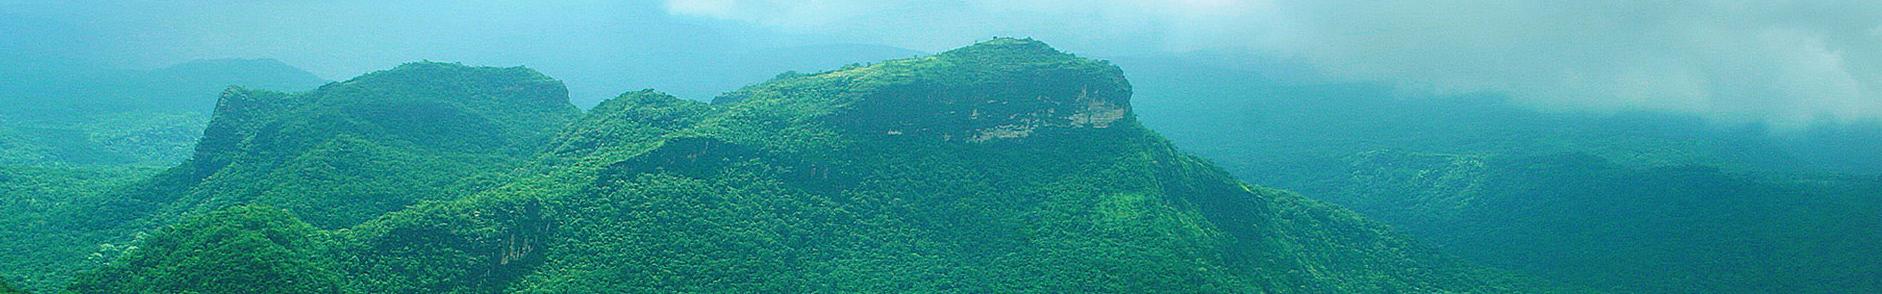 Pachmarhi Travel  U0026 Tour Tourism Guide  Madhya Pradesh